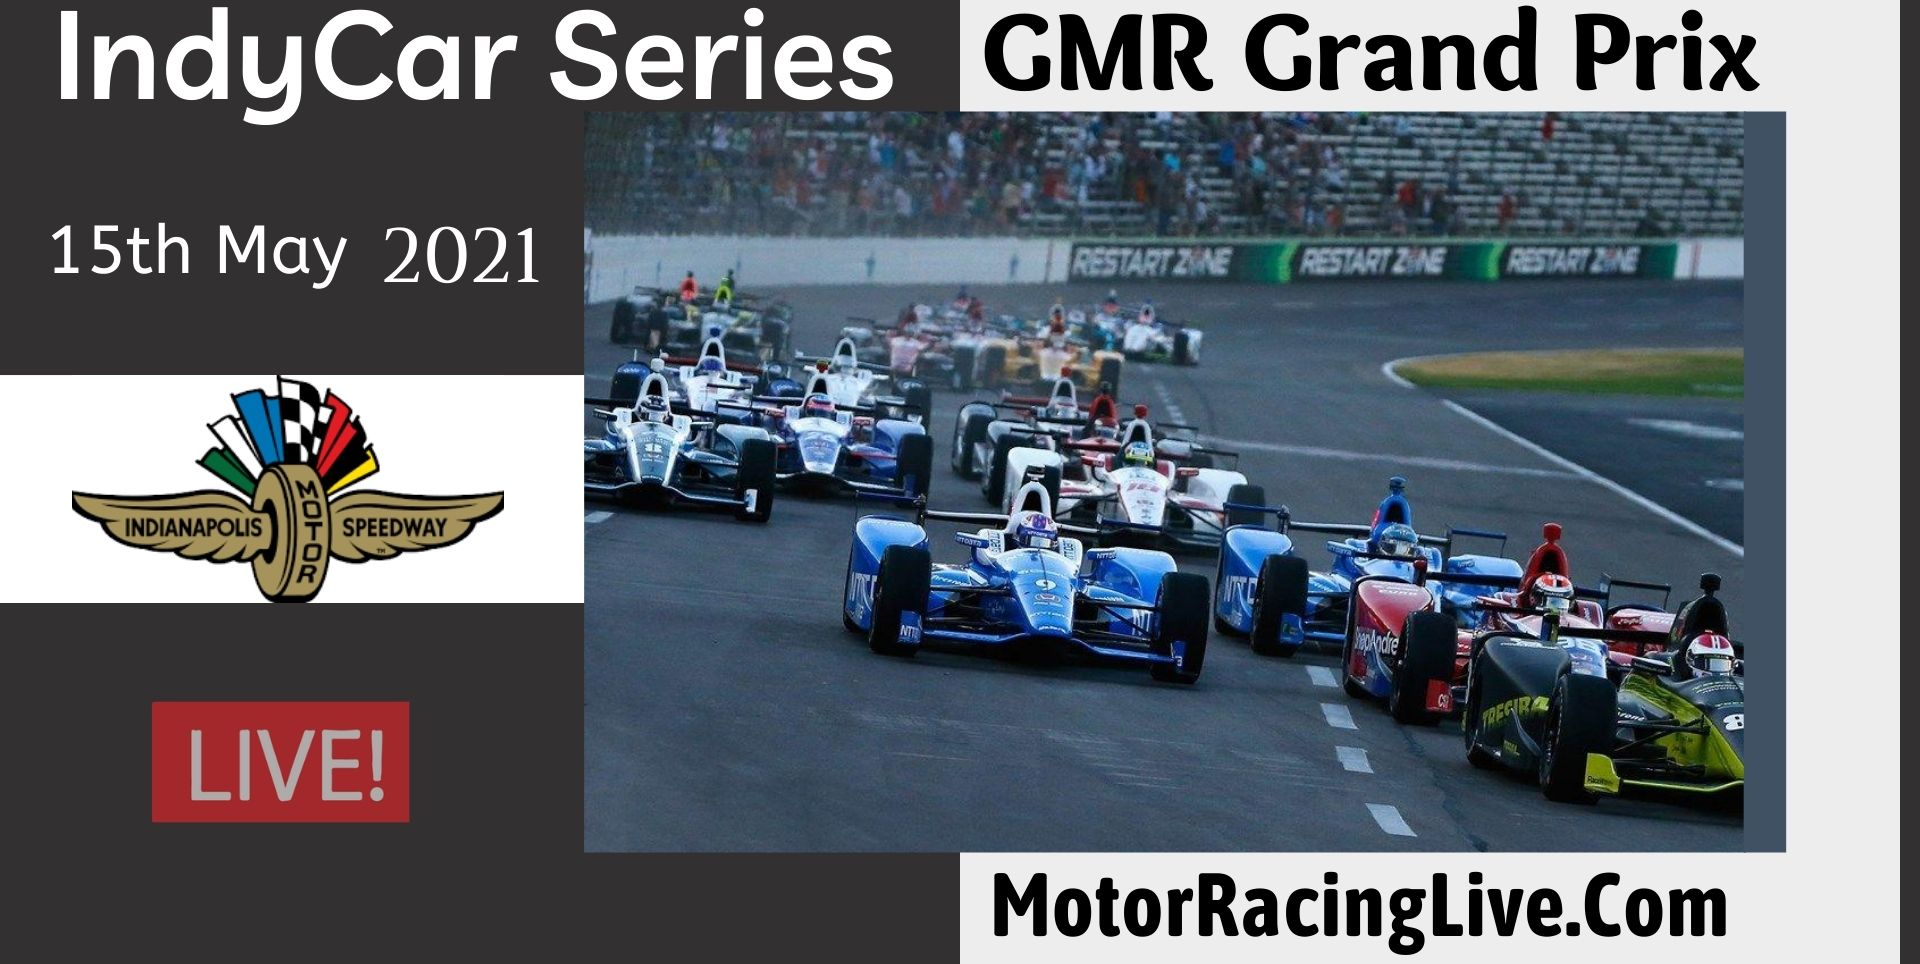 GMR Grand Prix Live Stream 2021 | Indycar